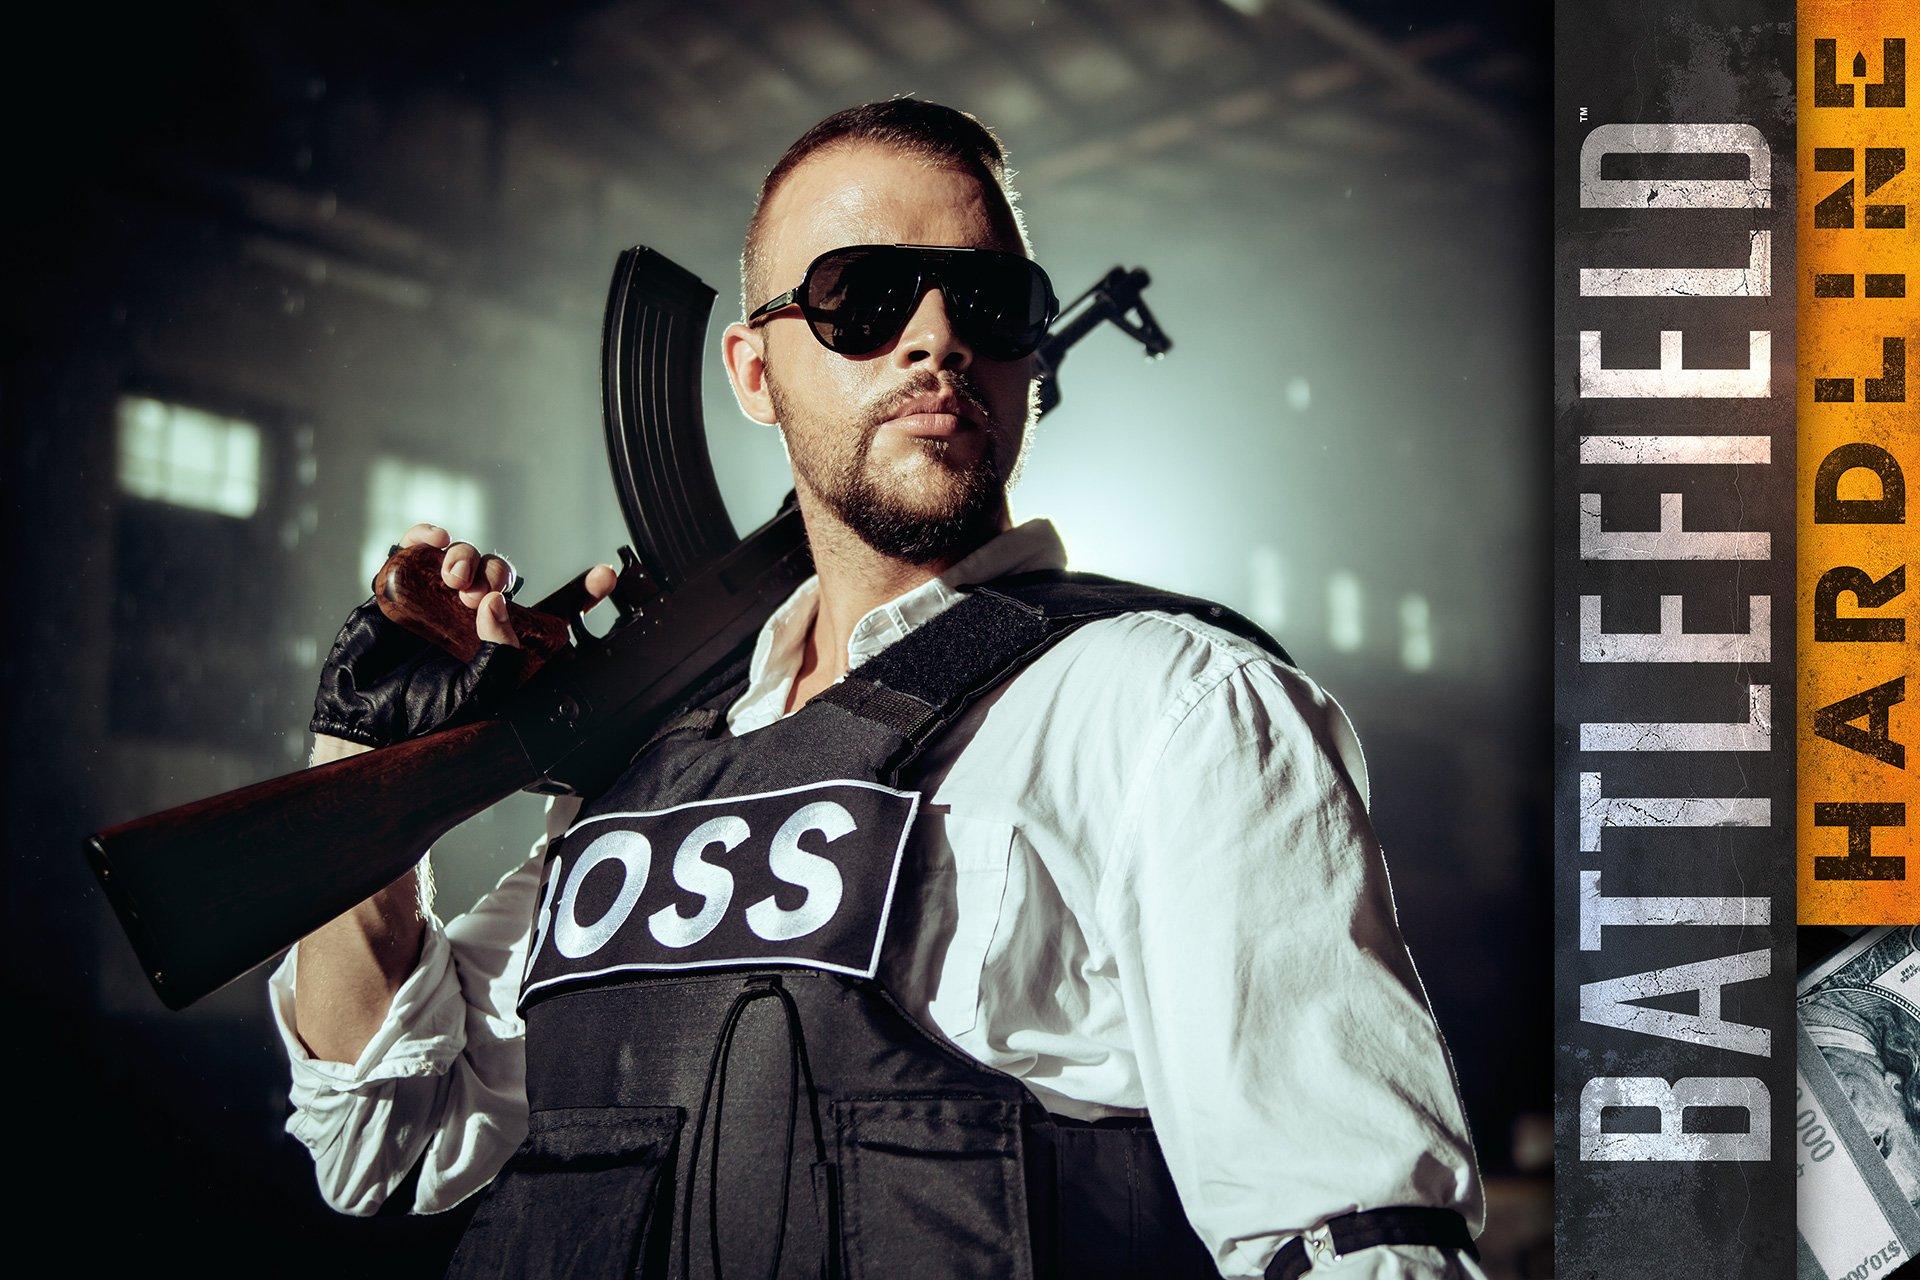 Assassins Creed Wallpaper Hd 1080p 15 Battlefield Hardline Wallpaper